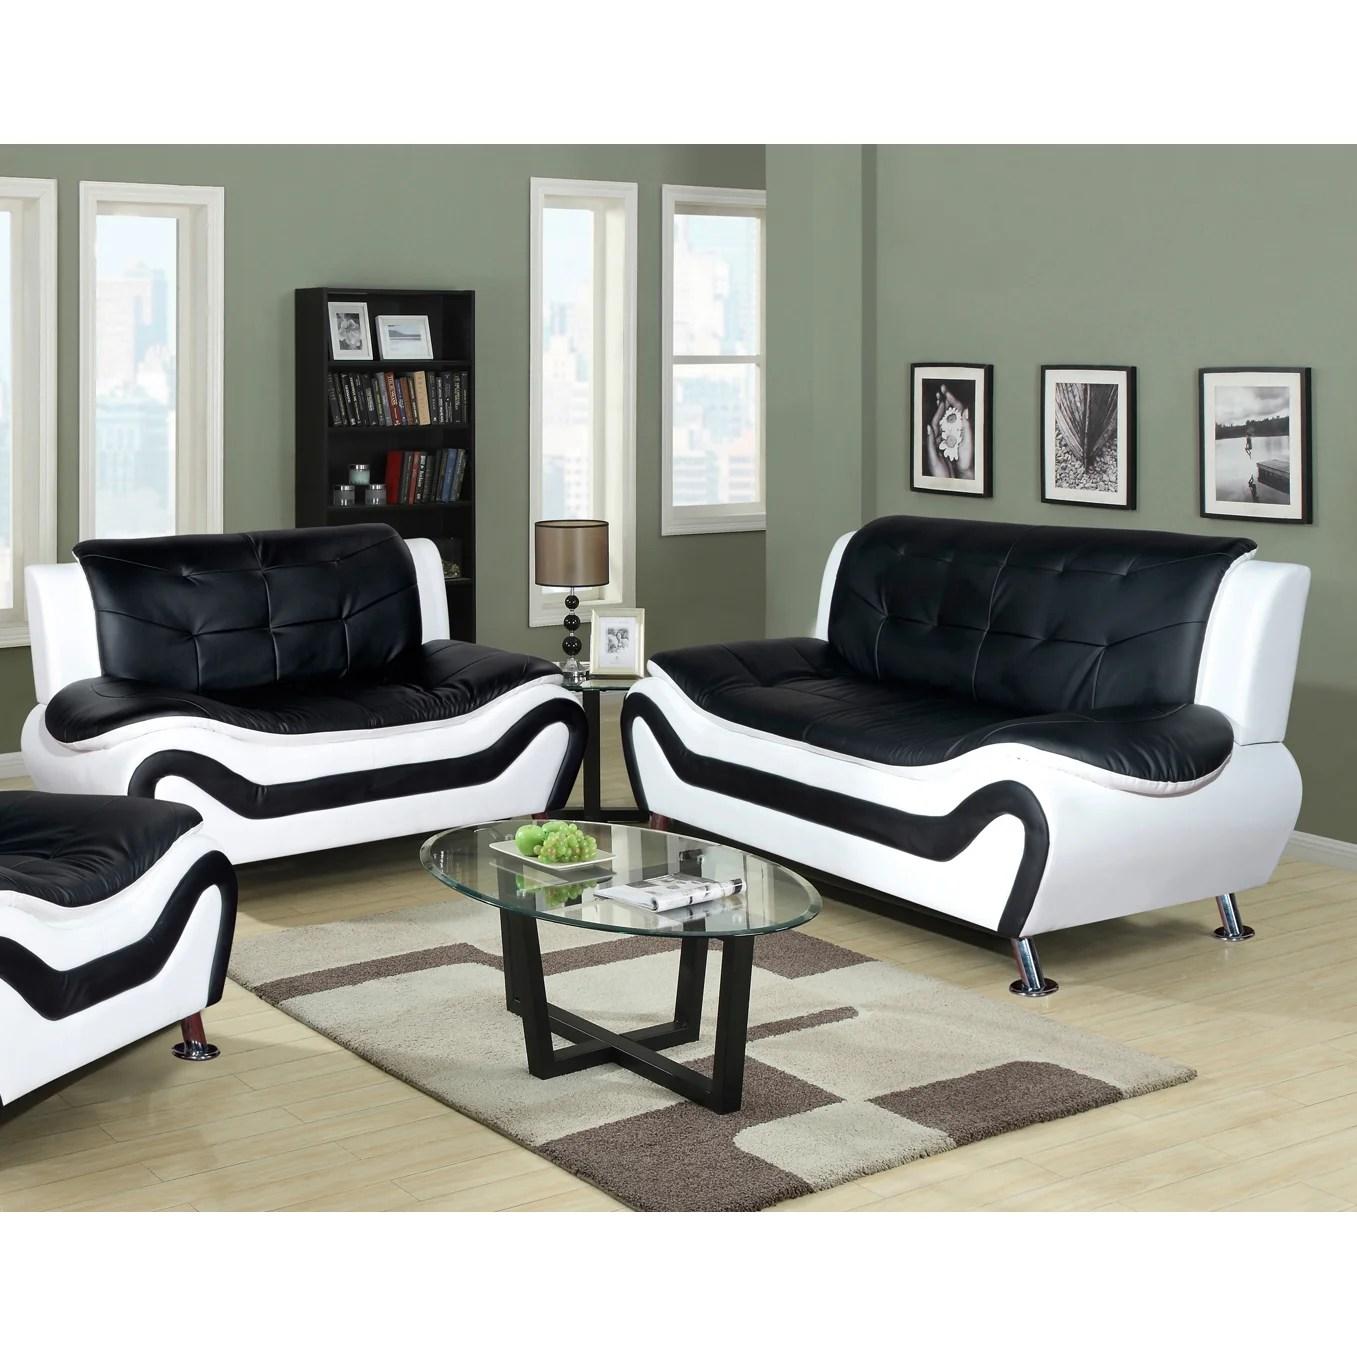 algarve leather sofa and loveseat set small comfy latitude run